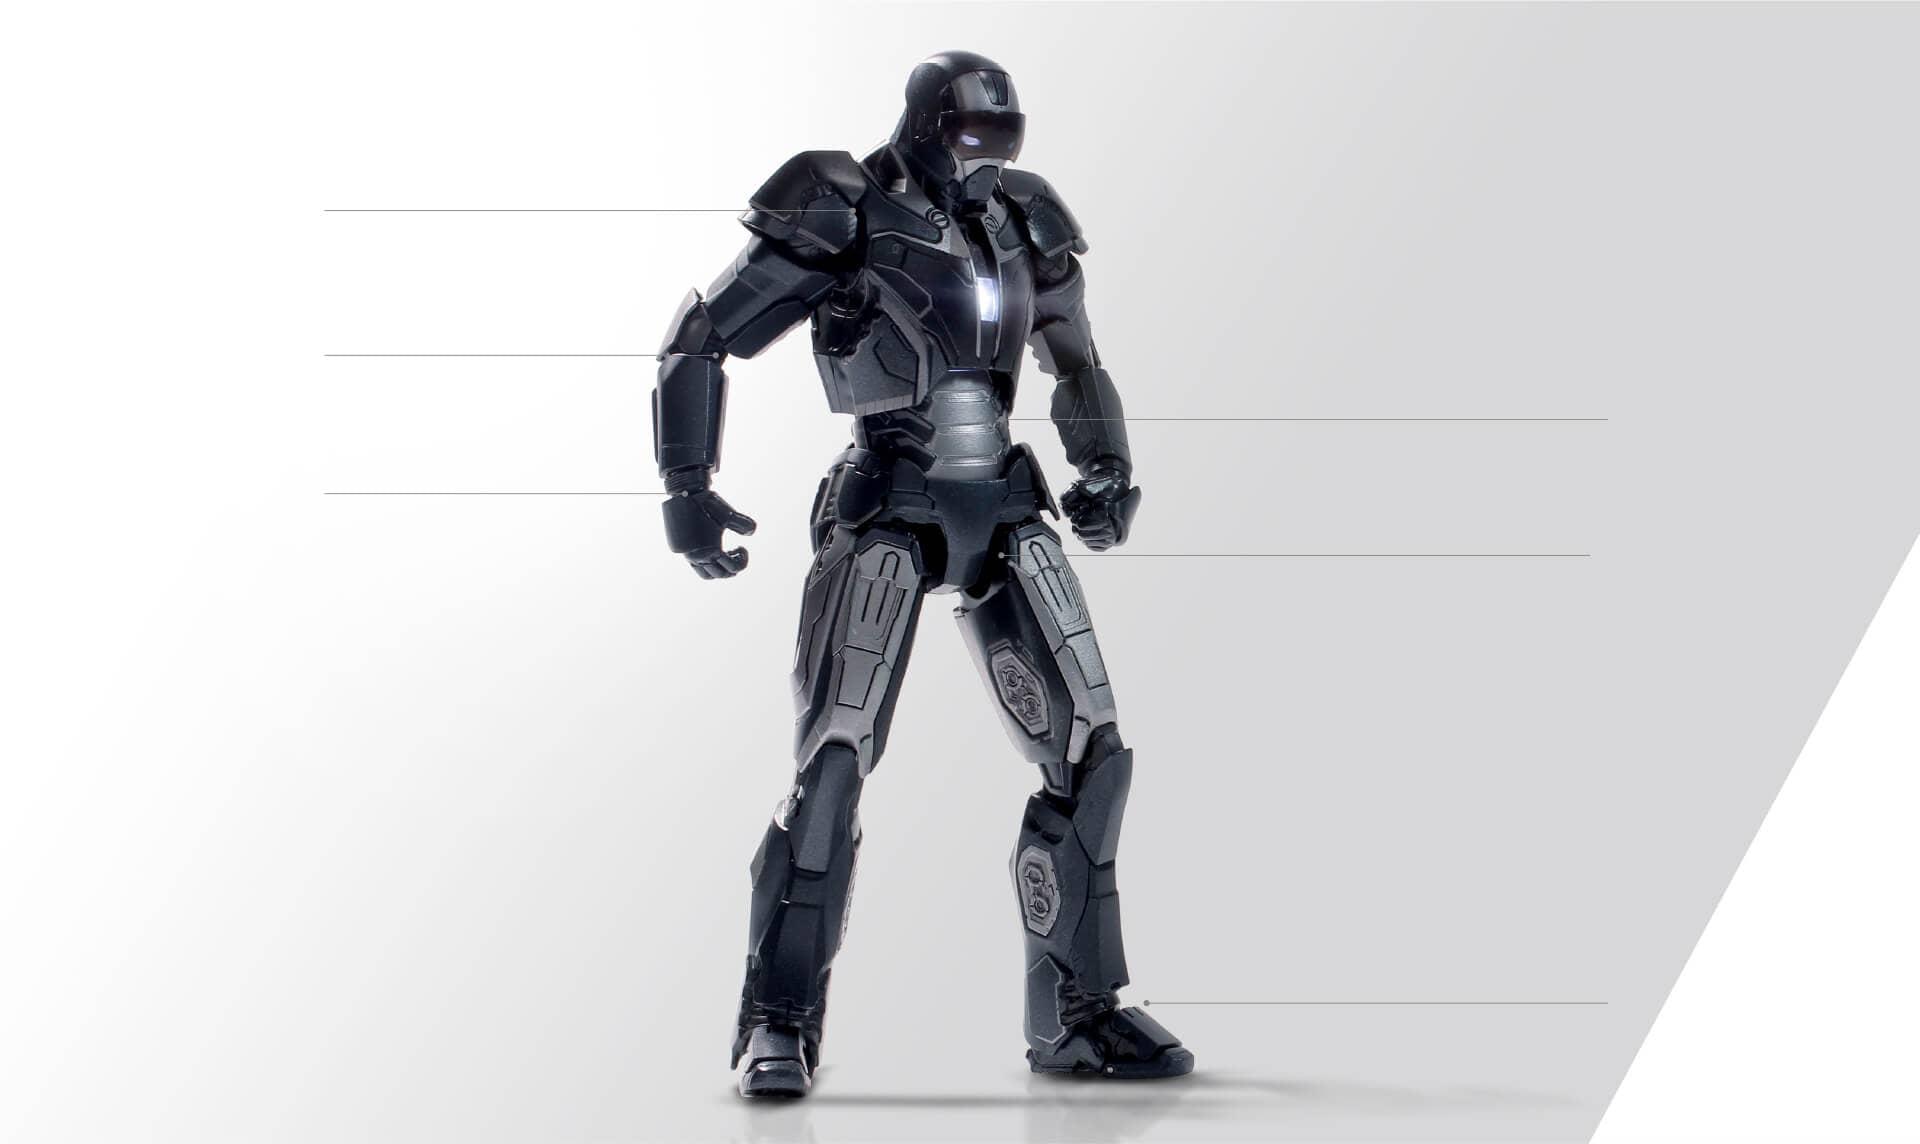 IRON MAN MK40 SHOTGUN FIGURA METAL 15,3 CM MARVEL IRON MAN 1/12 SCALE COLLECTIBLE FIGURE